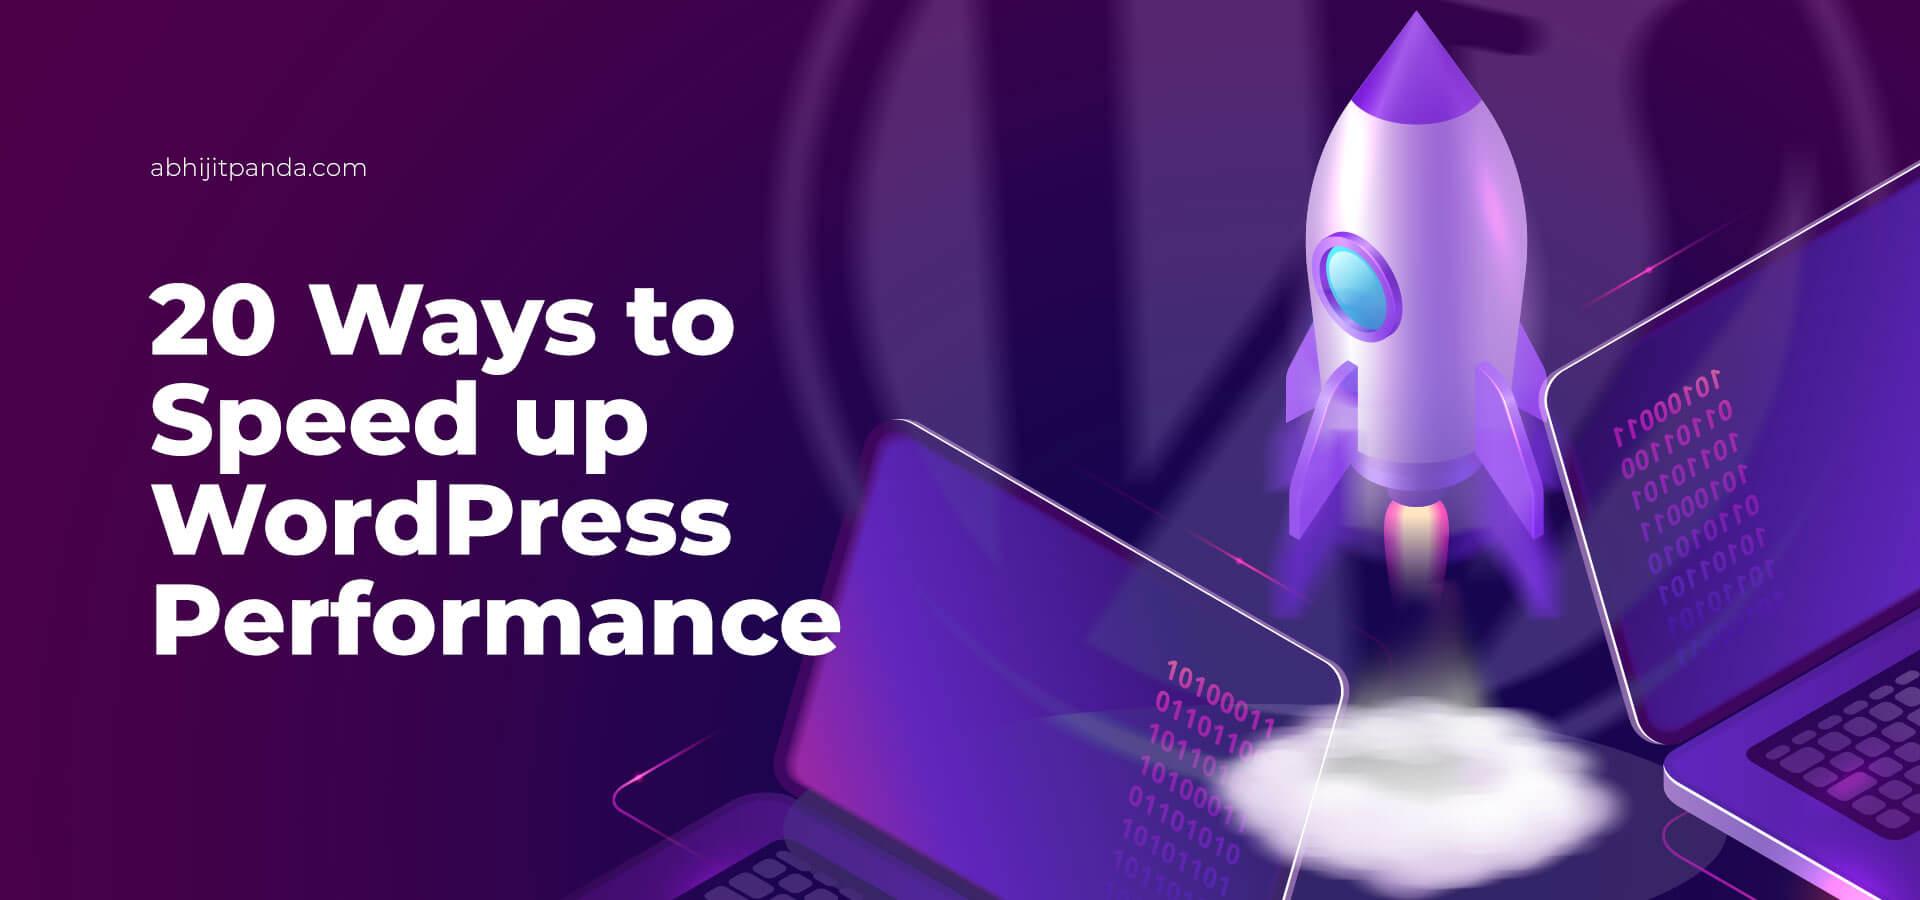 20 Ways to Speed up WordPress Performance